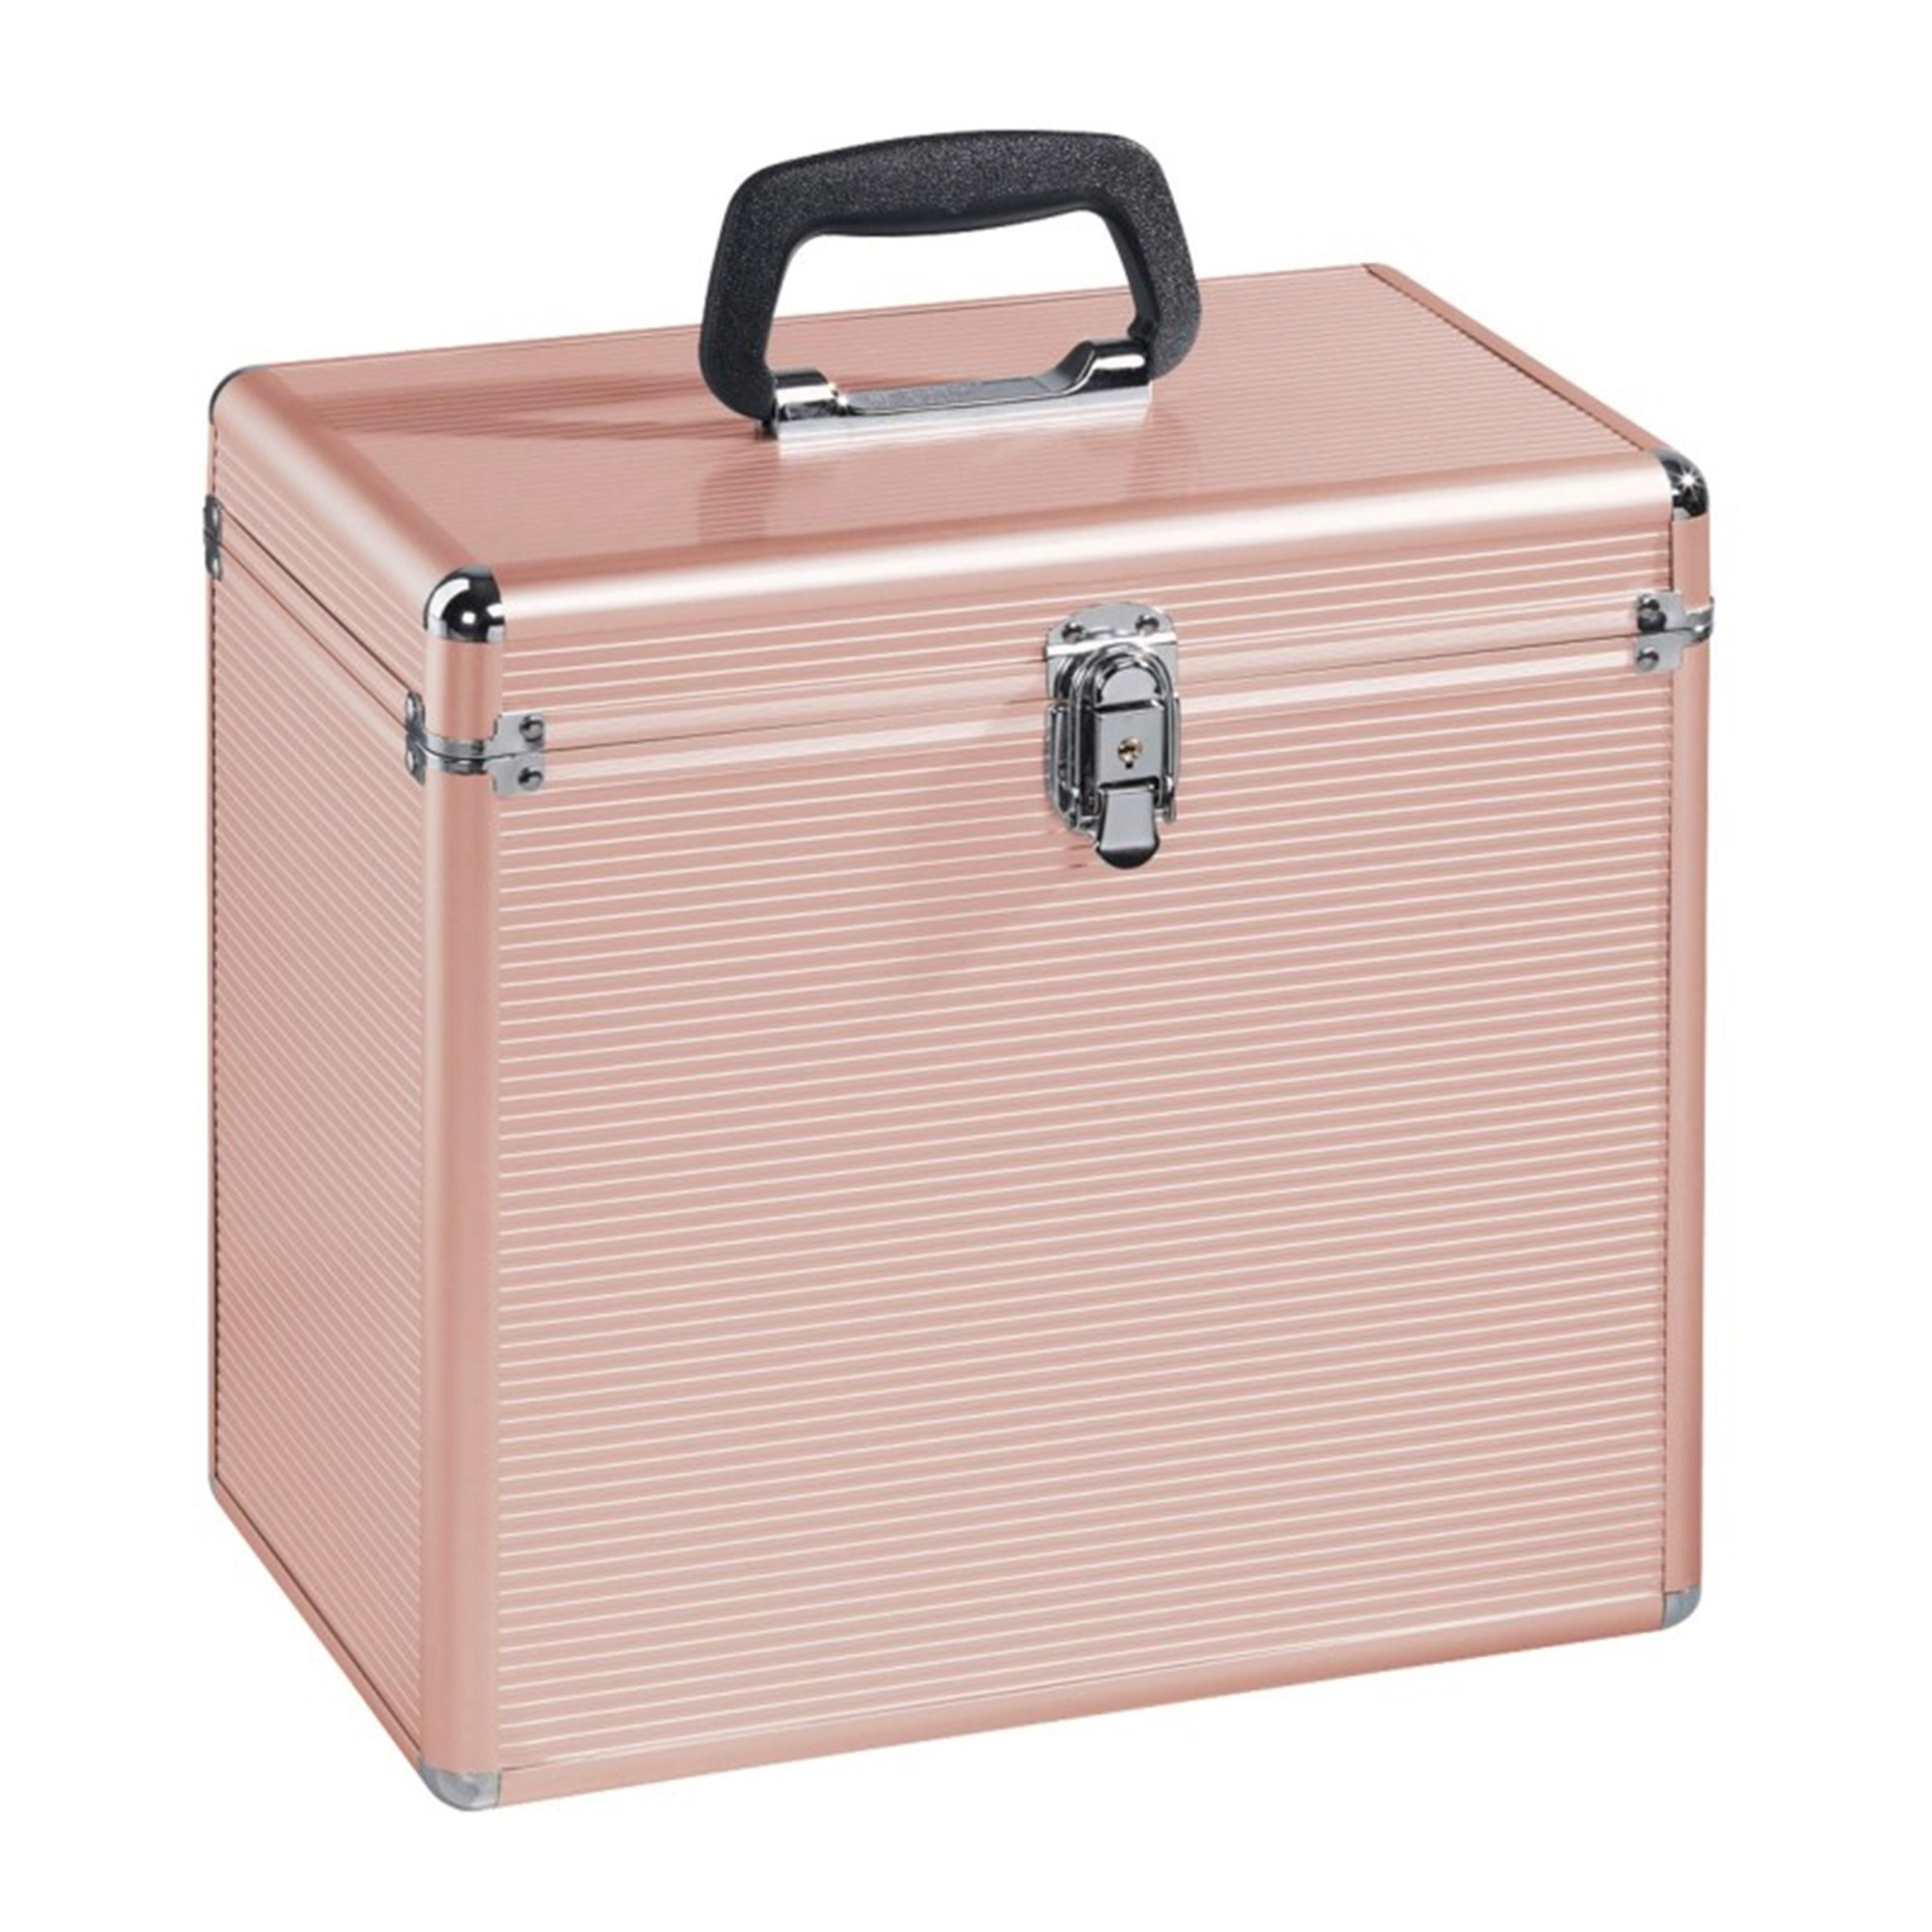 Hama Rose Gold Case for LP Storage - 1